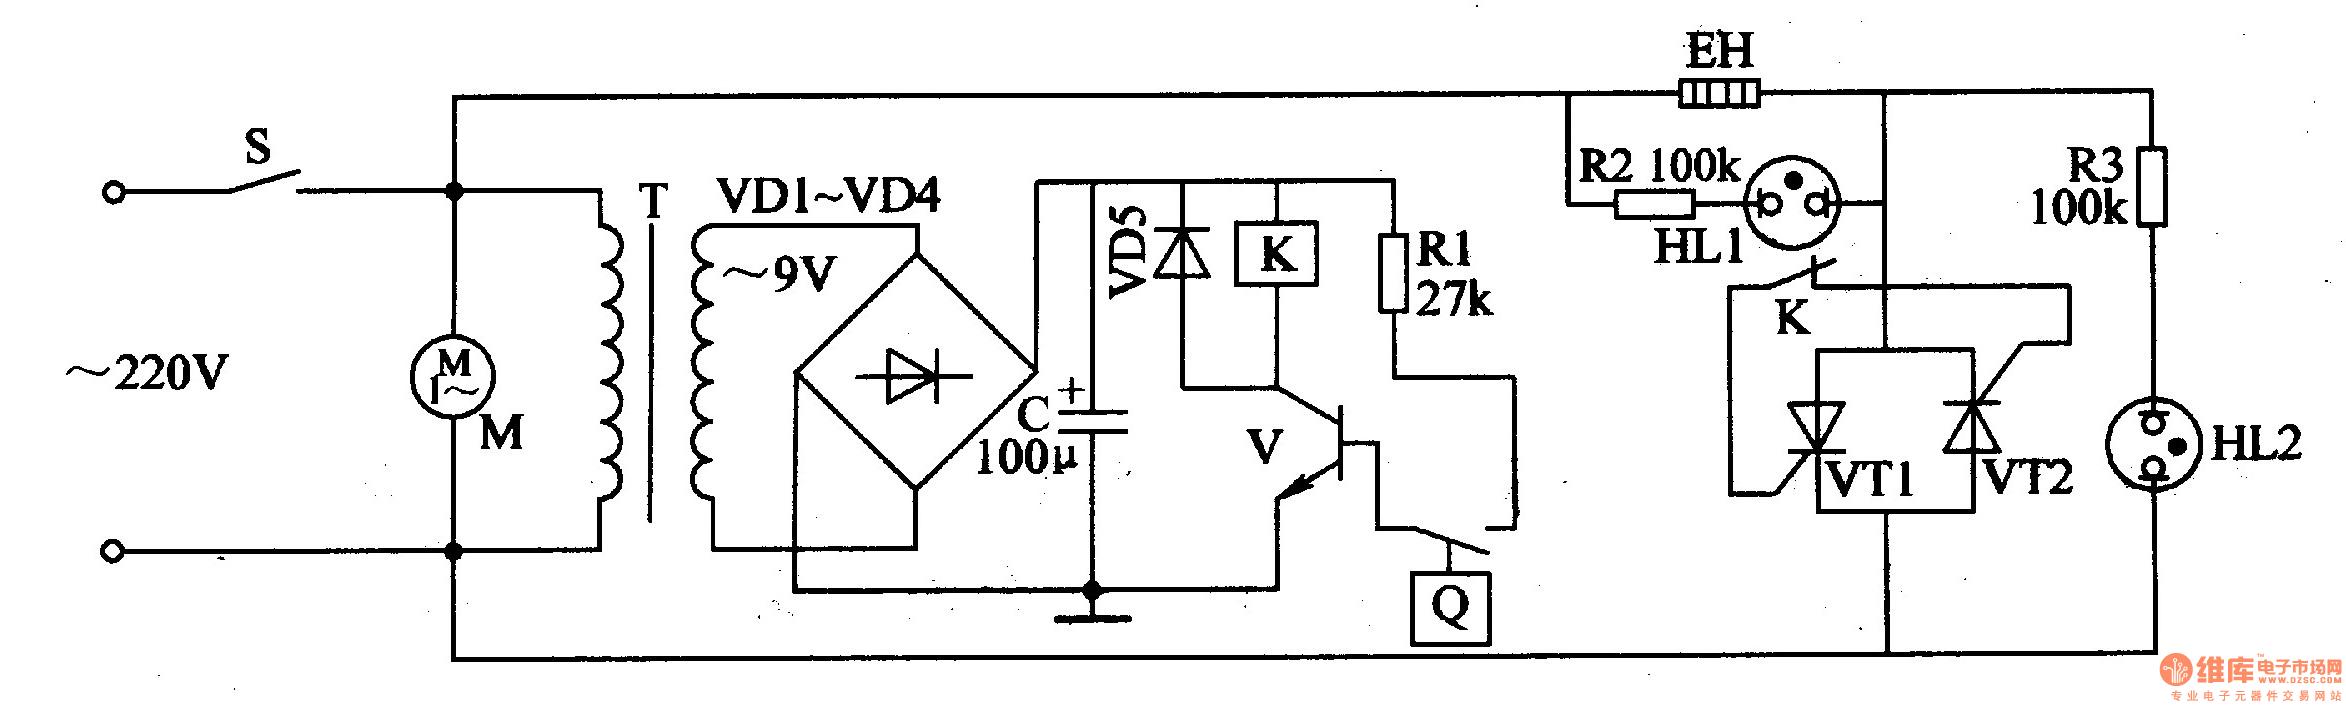 The Eggs Hatching Incubator Circuit Diagram 1